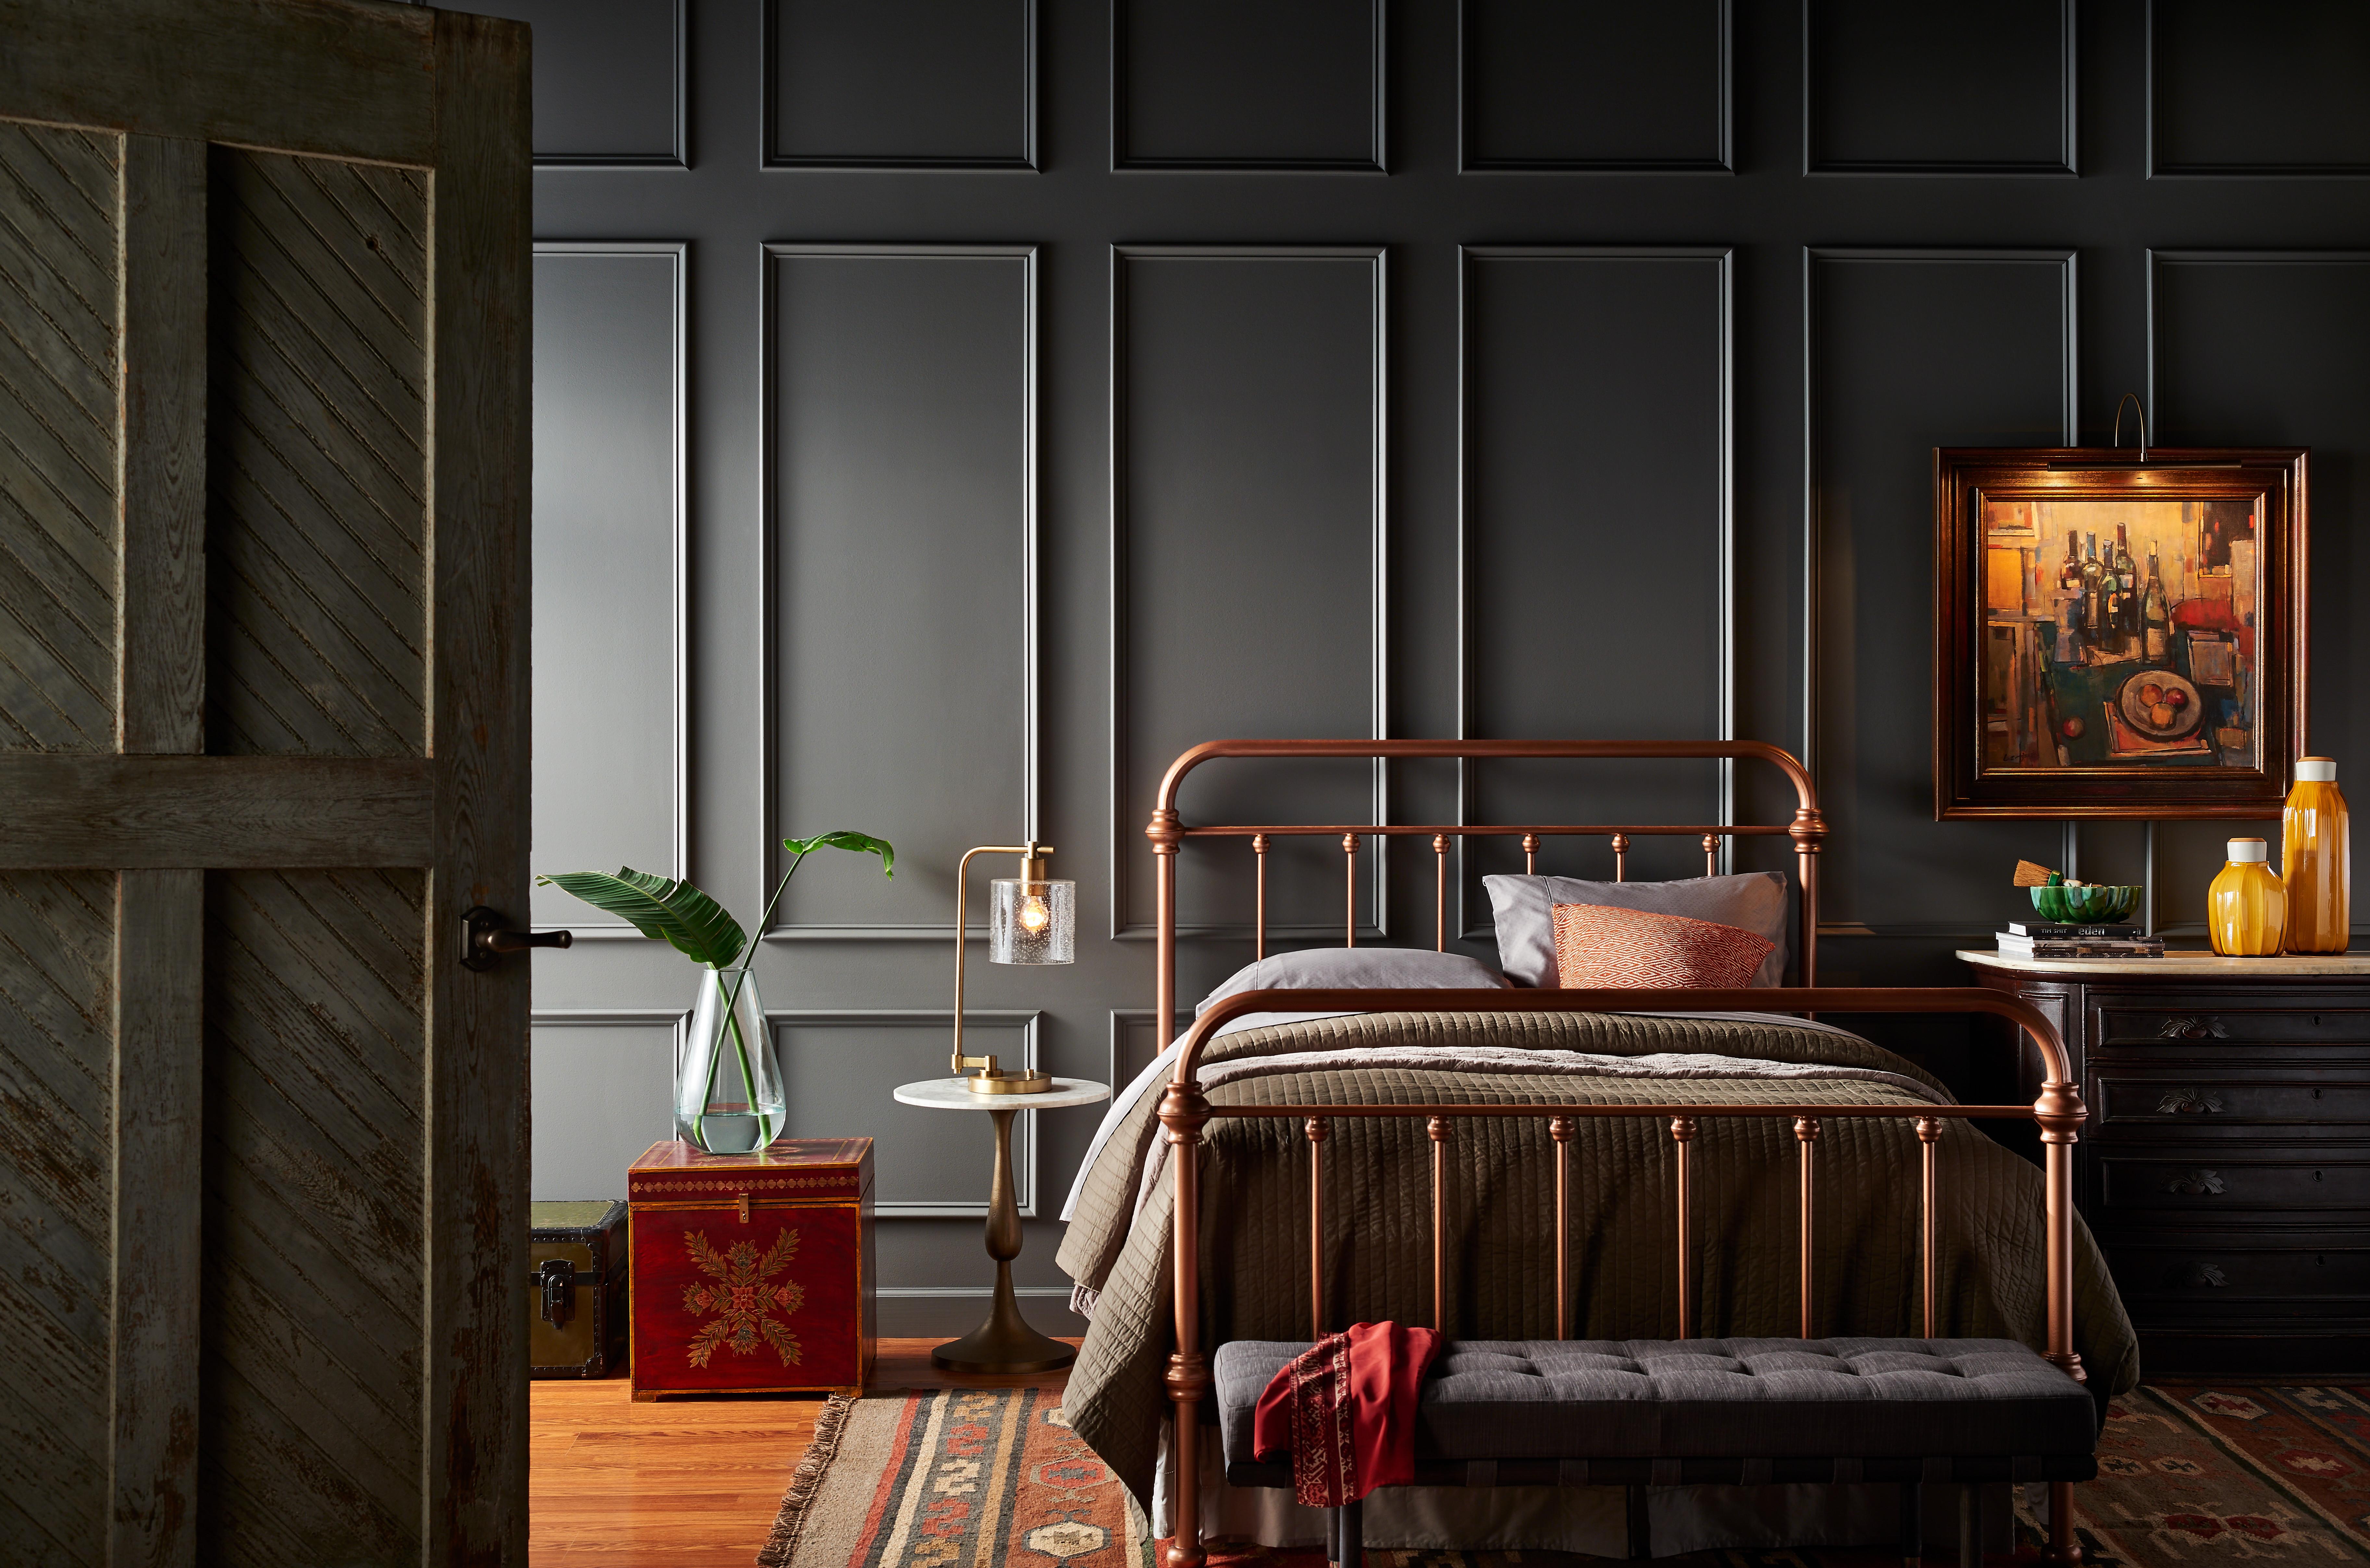 behr-color-currents-2017-bedroom-composed-palette